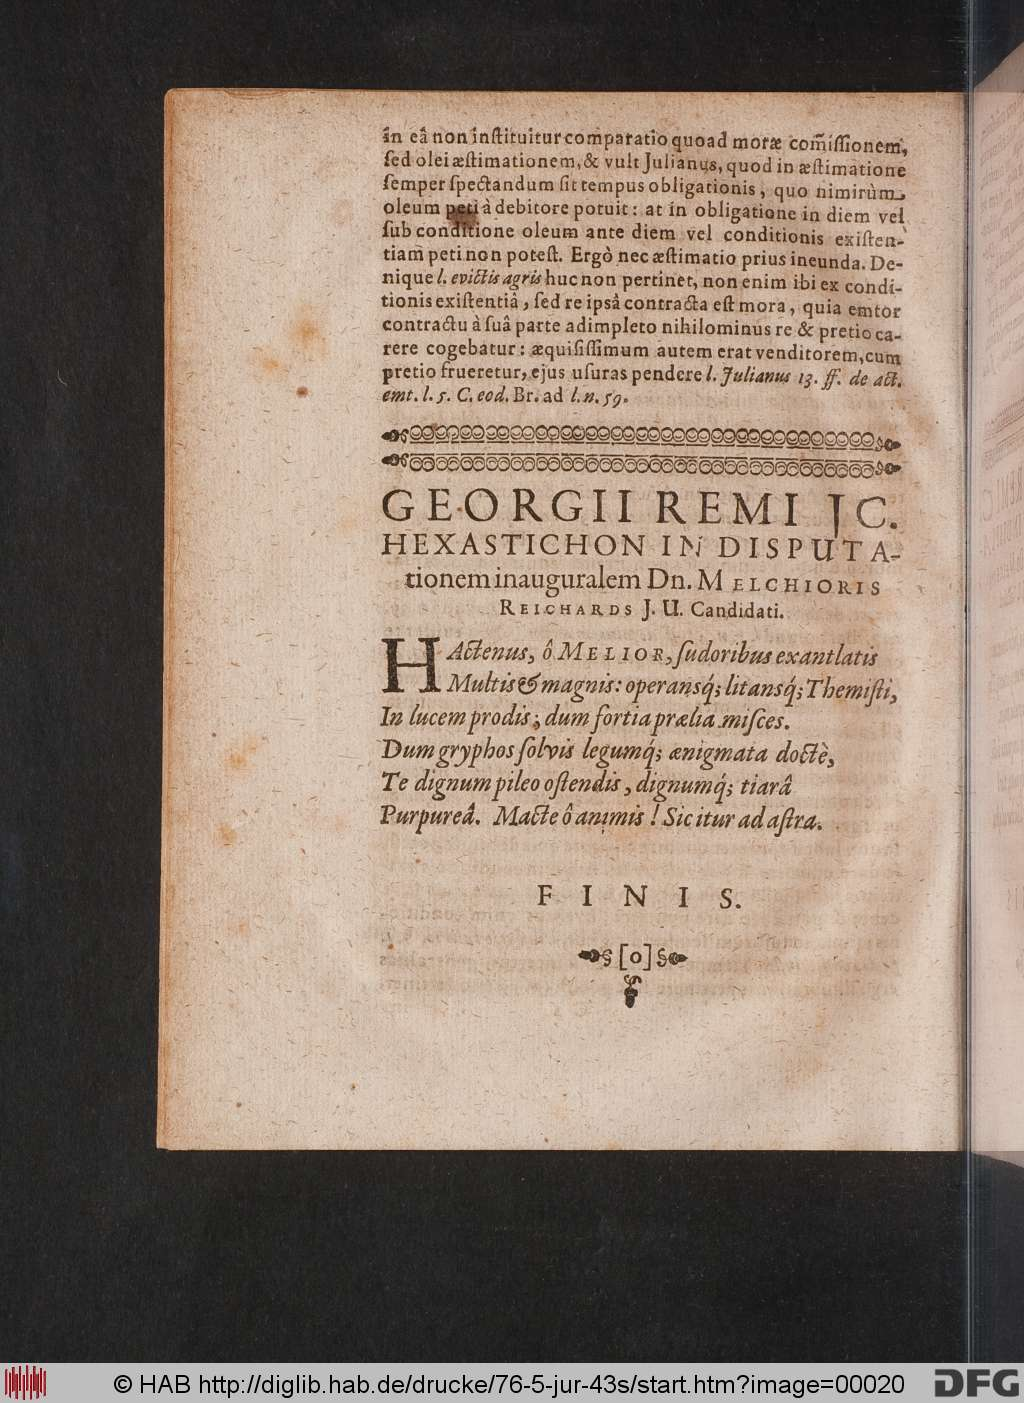 http://diglib.hab.de/drucke/76-5-jur-43s/00020.jpg